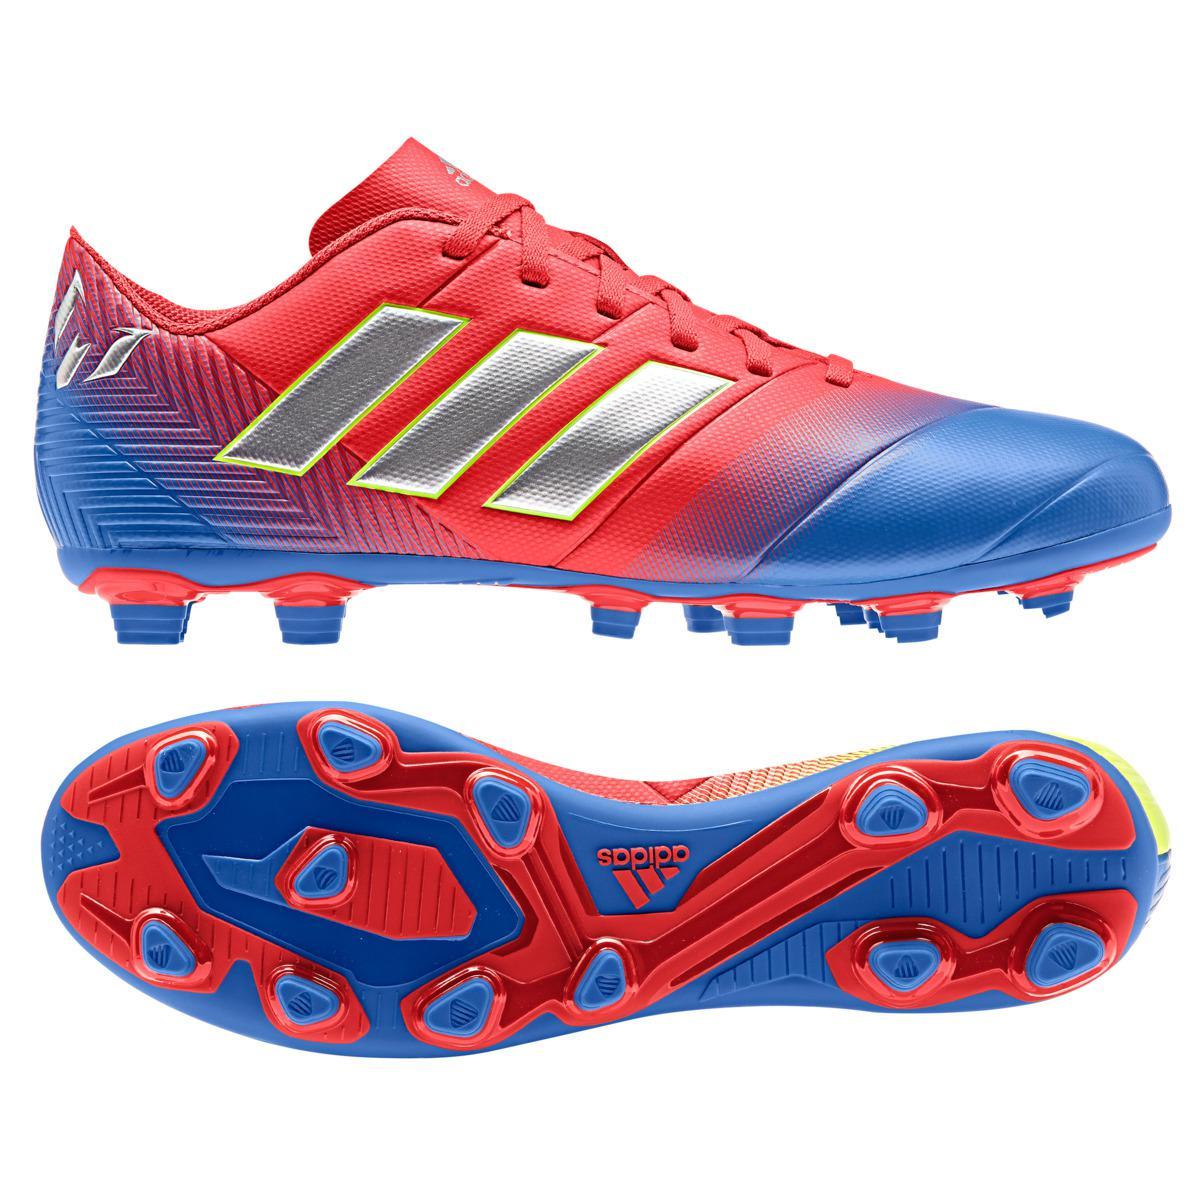 2c8ee001a Adidas - Red Nemeziz Messi 18.4 Fxg Football Boots for Men - Lyst. View  fullscreen